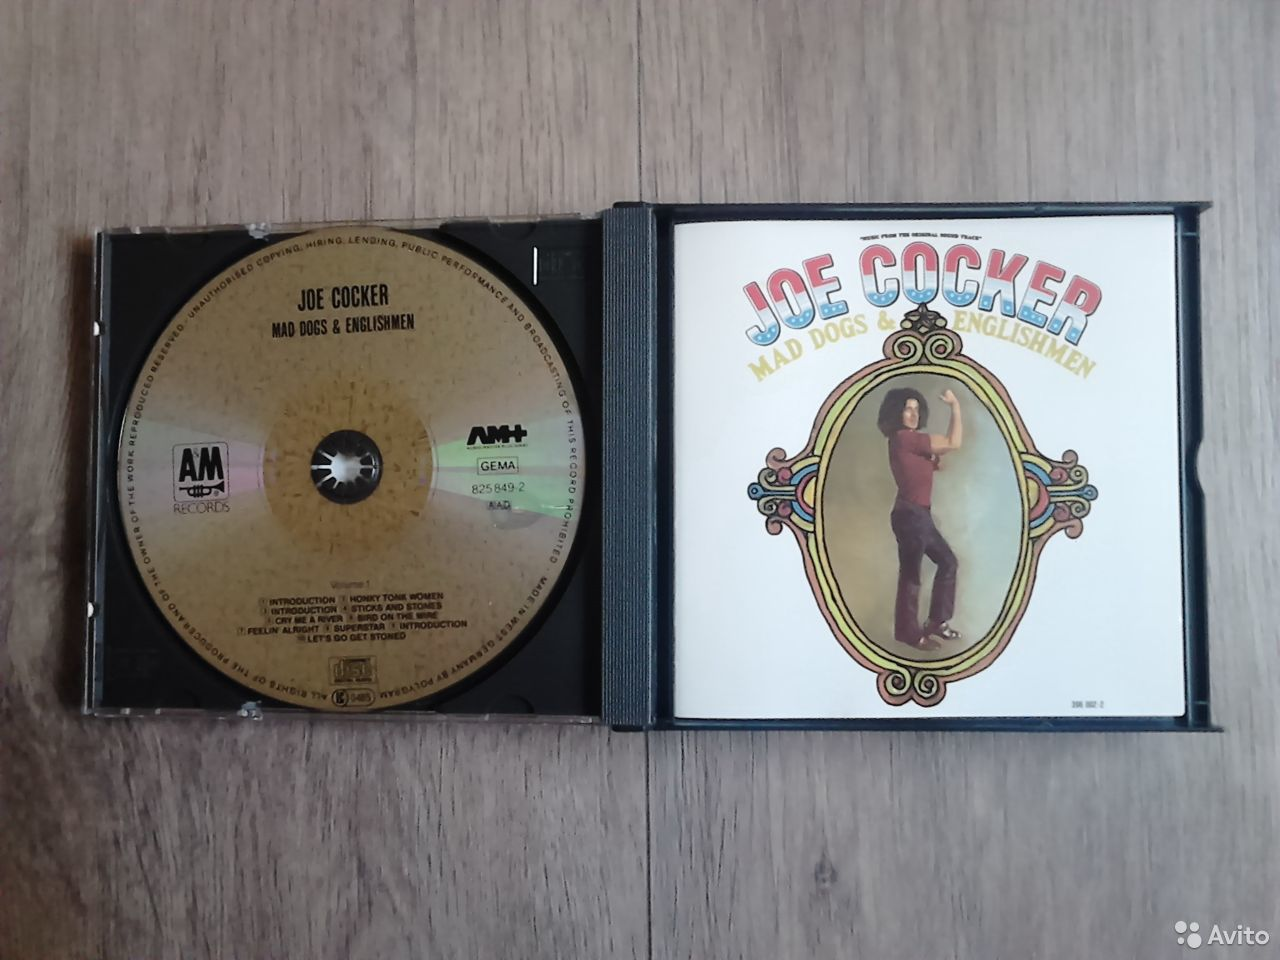 Joe Cocker Mad Dogs & Englishman 2CD